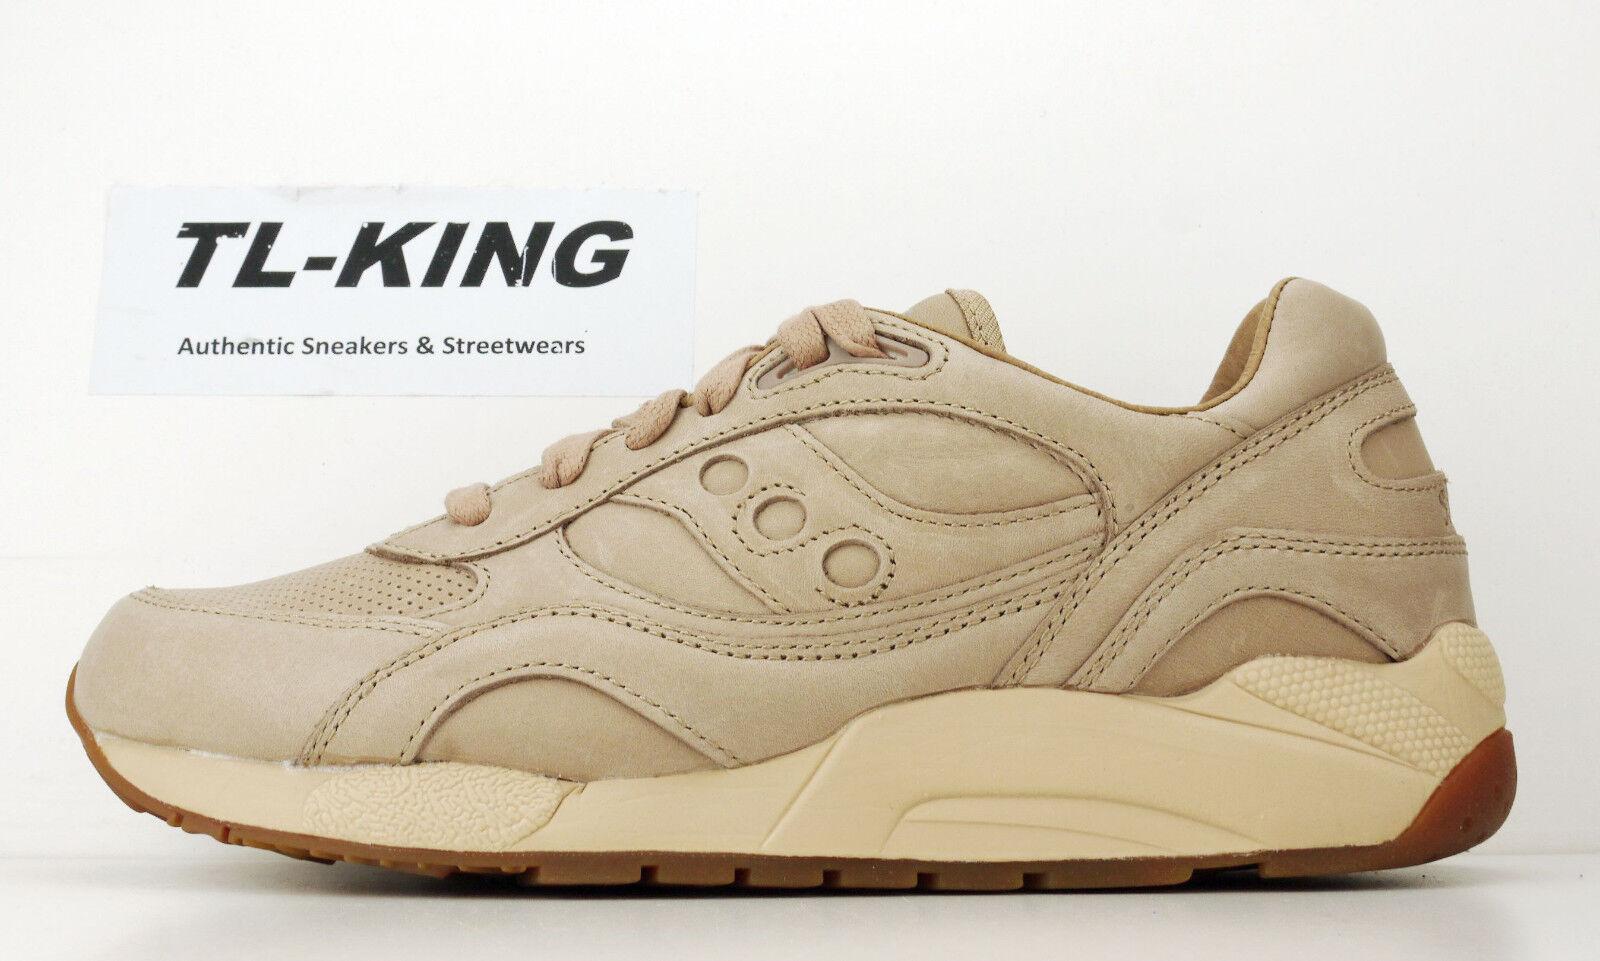 Saucony Originals G9 Shadow 6 Premium 6000 Veg Tan Pack S70314-1 S70314-1 Pack Msrp  120 Hy 85e114